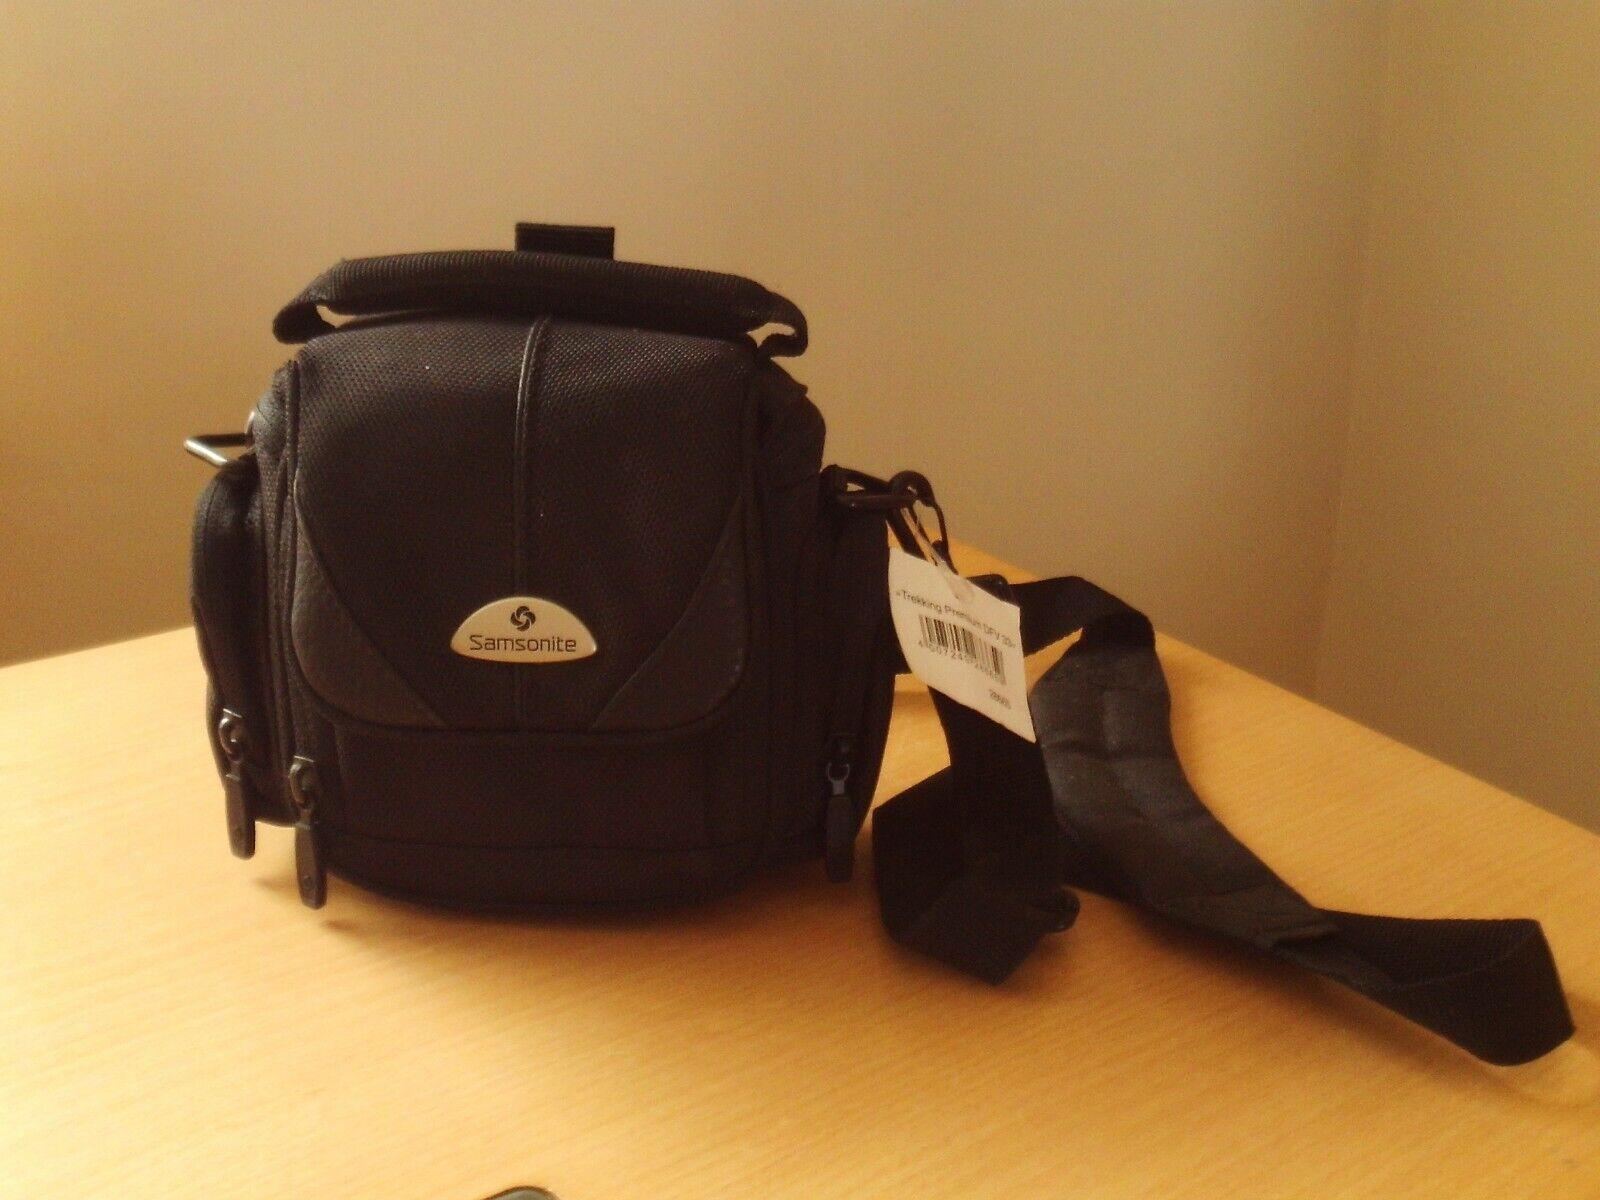 Samsonite Trekking Premium DFV 33 Camera Bag Carry Case Lots Of Zip Pockets.